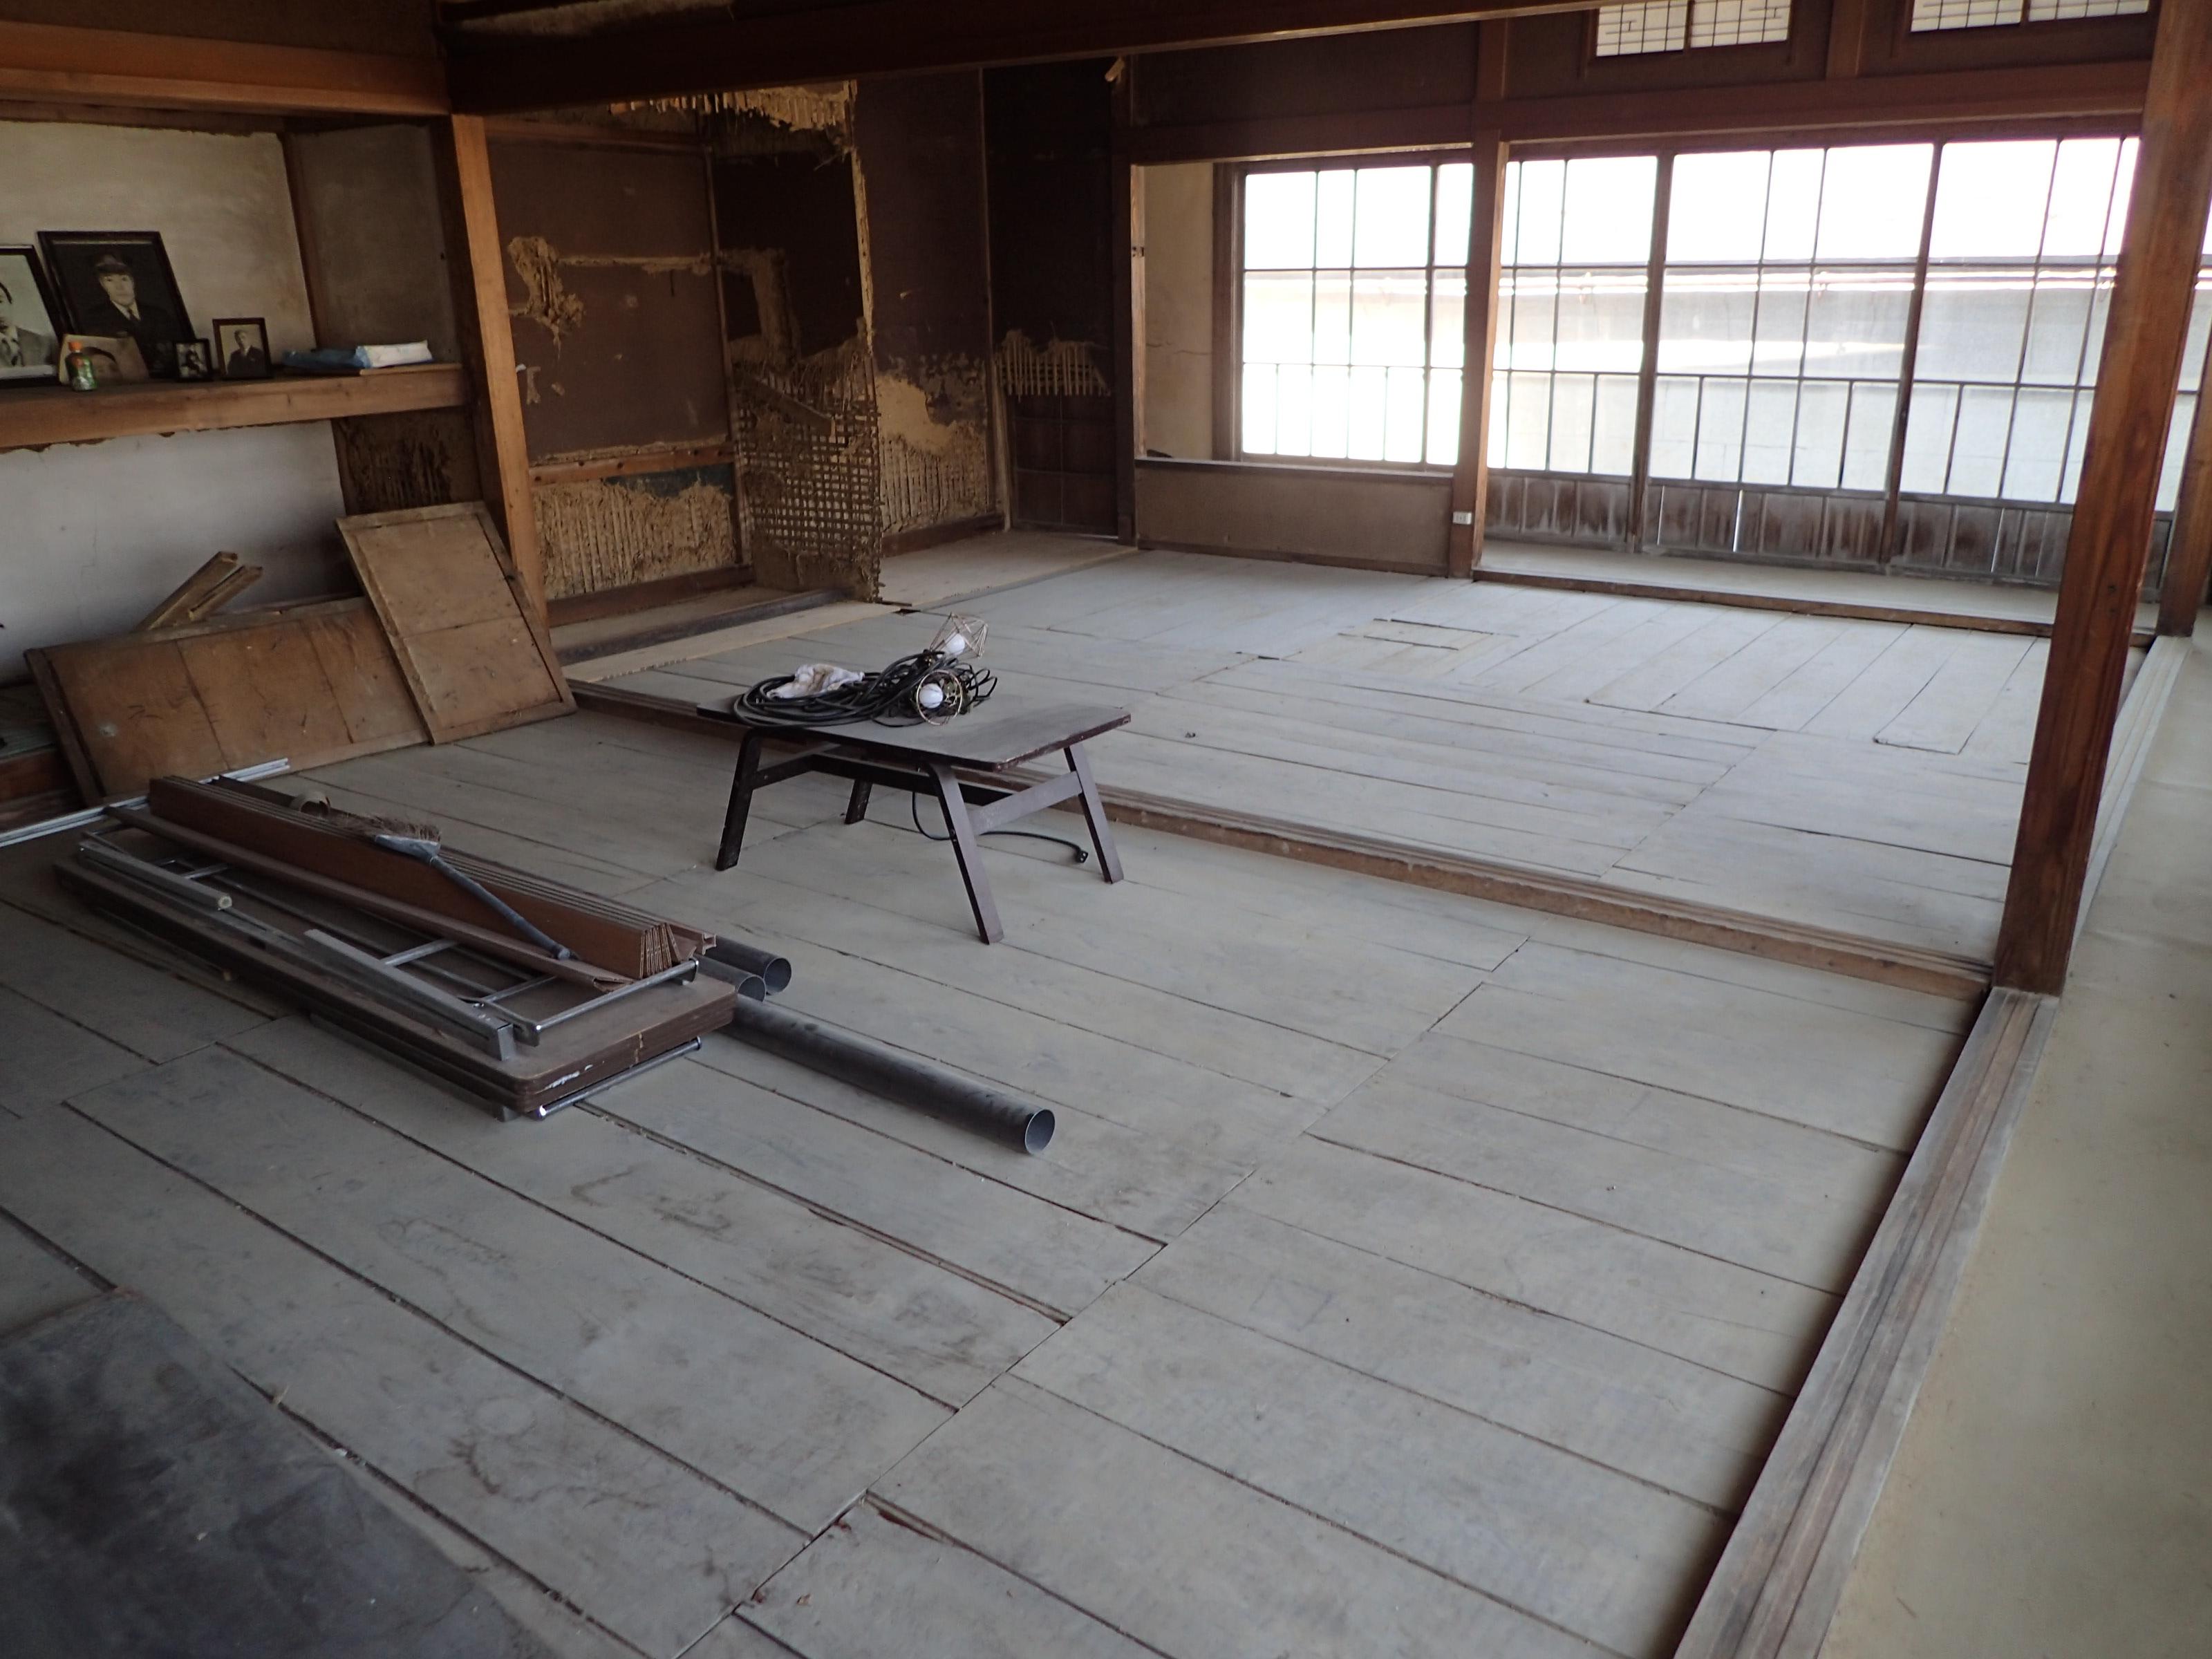 Chida house during conservation, Kesennuma, Japan